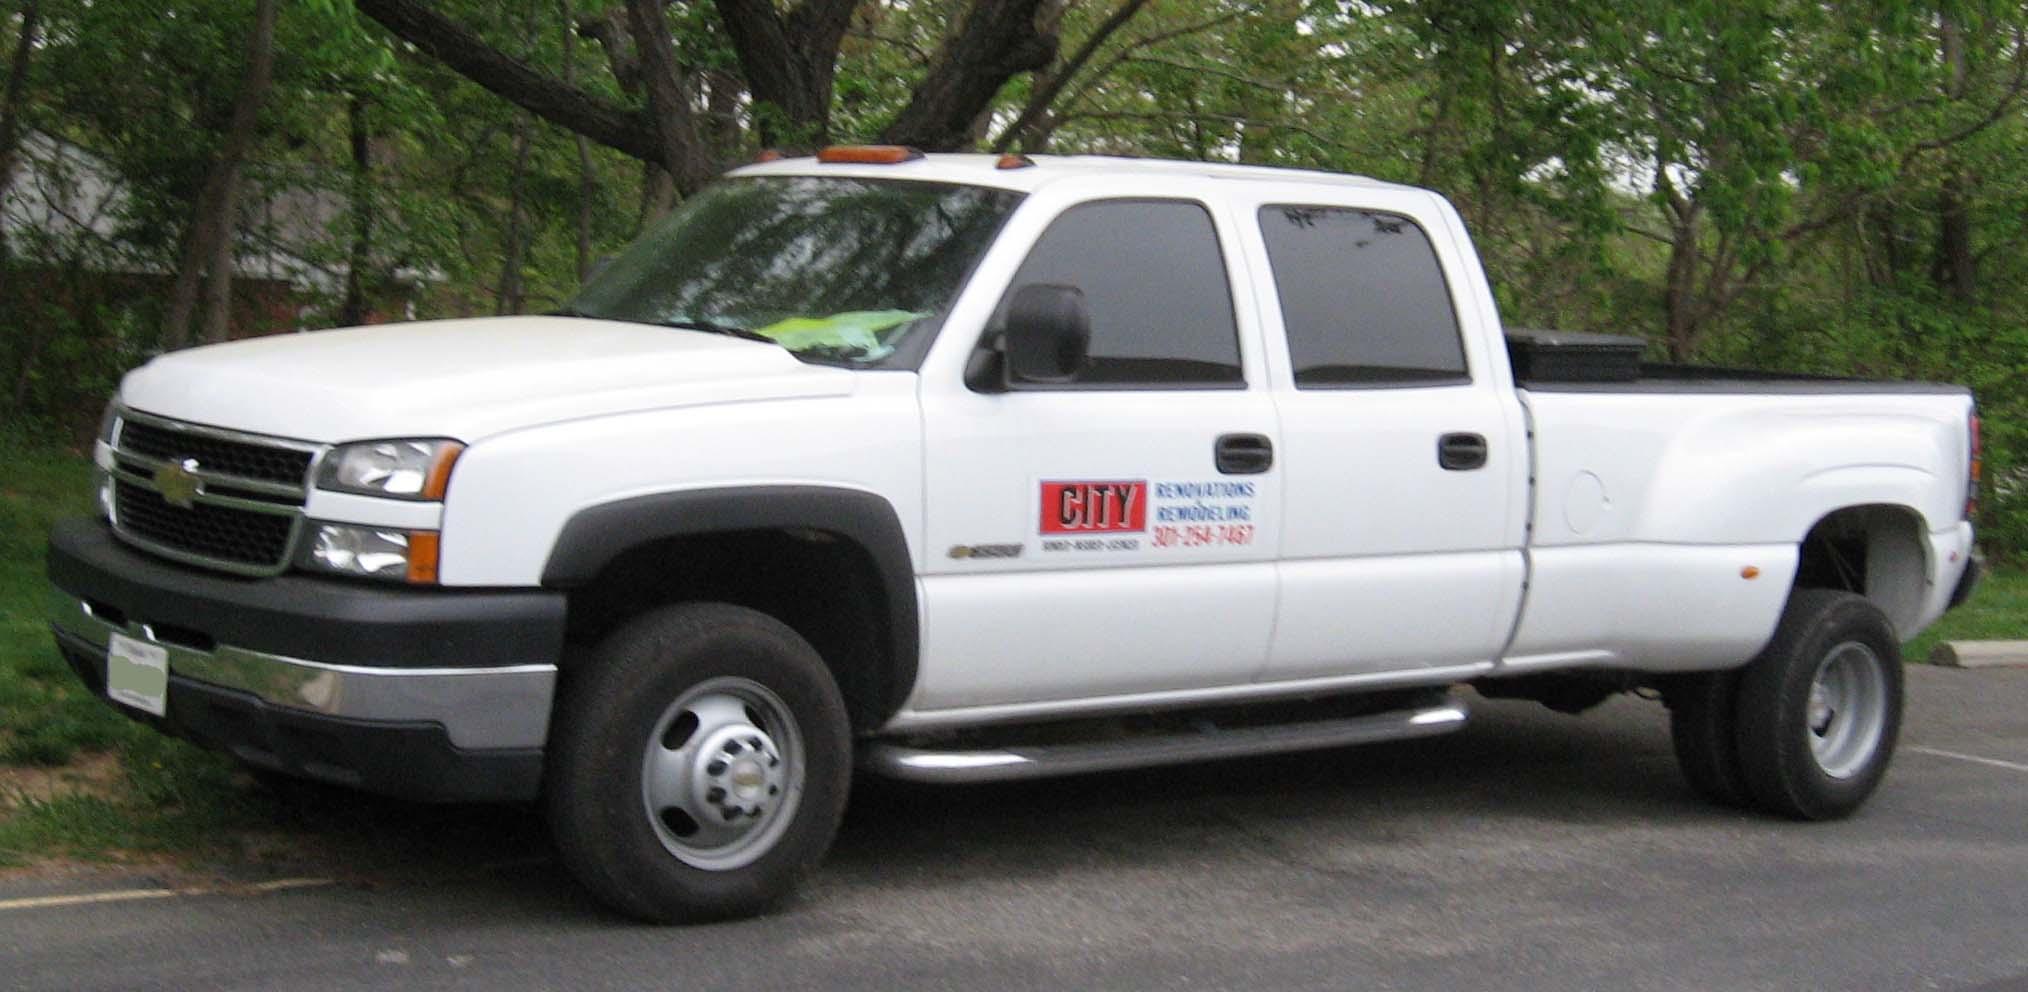 File:Chevrolet-Silverado-3500.jpg - Wikimedia Commons